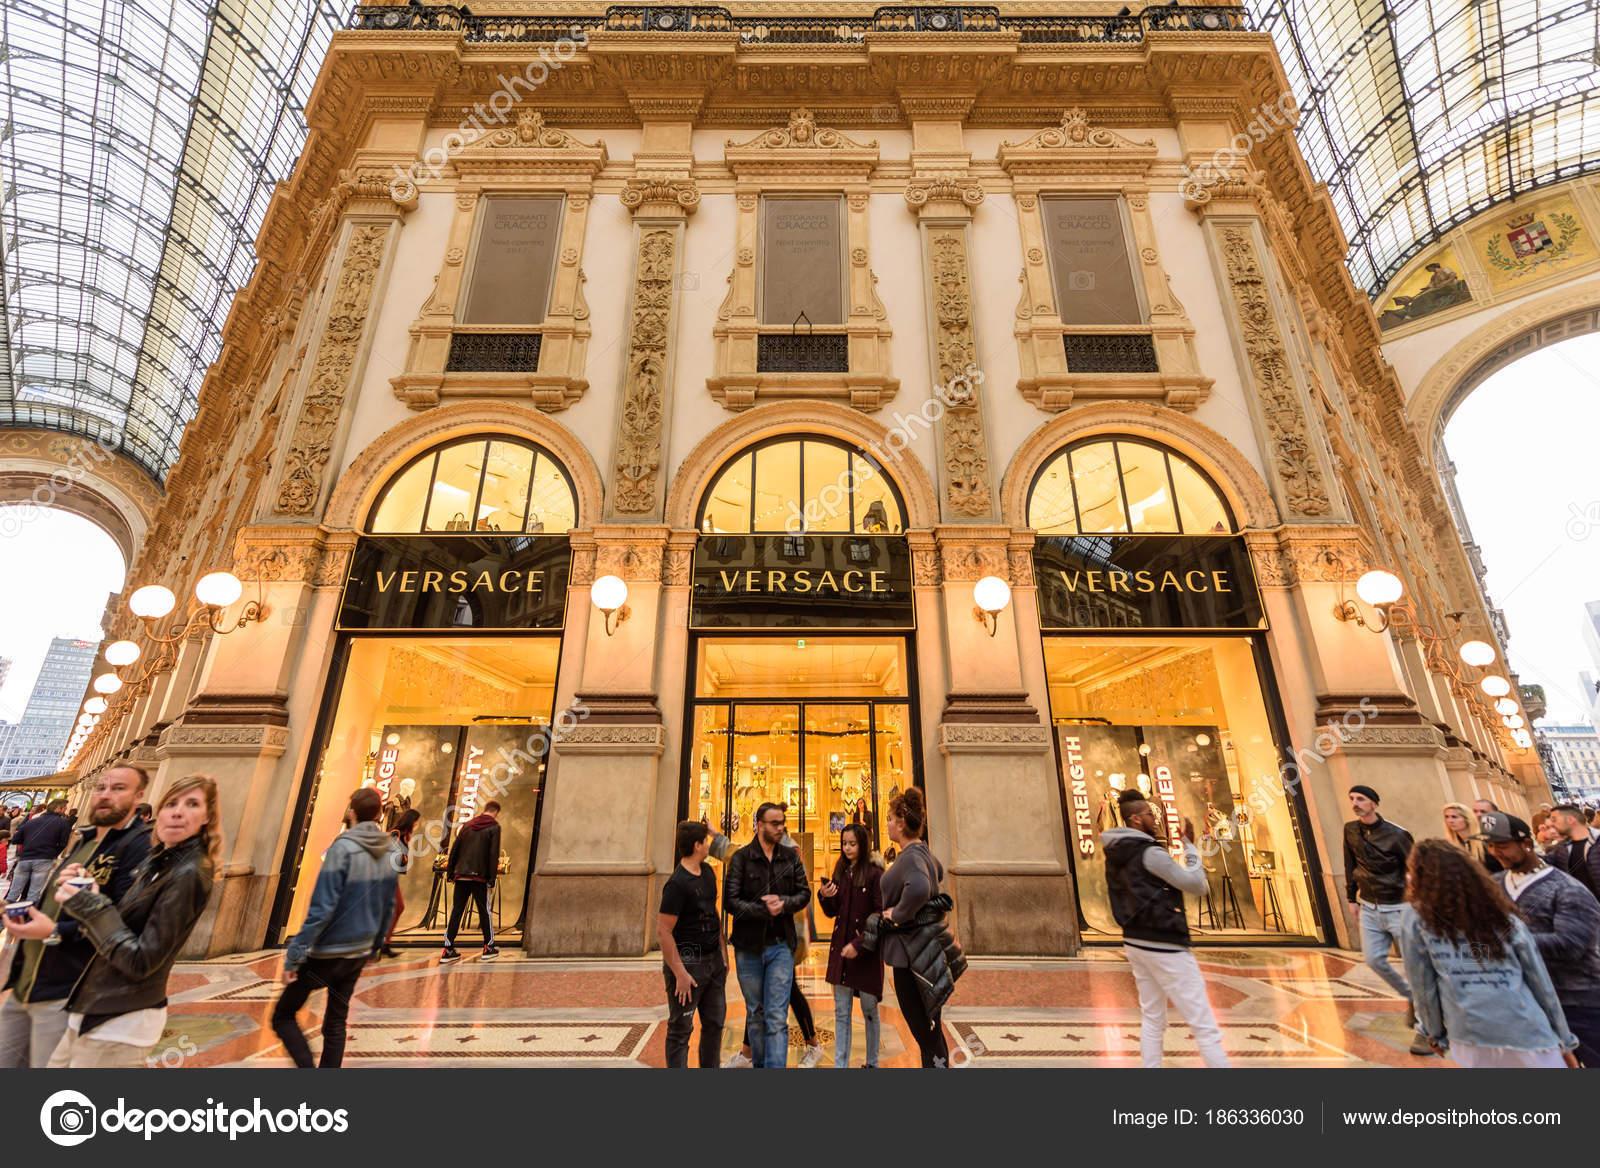 8bfba9ab9a Milan Italy October 2017 Versace Boutique Galleria Vittorio Emanuele ...